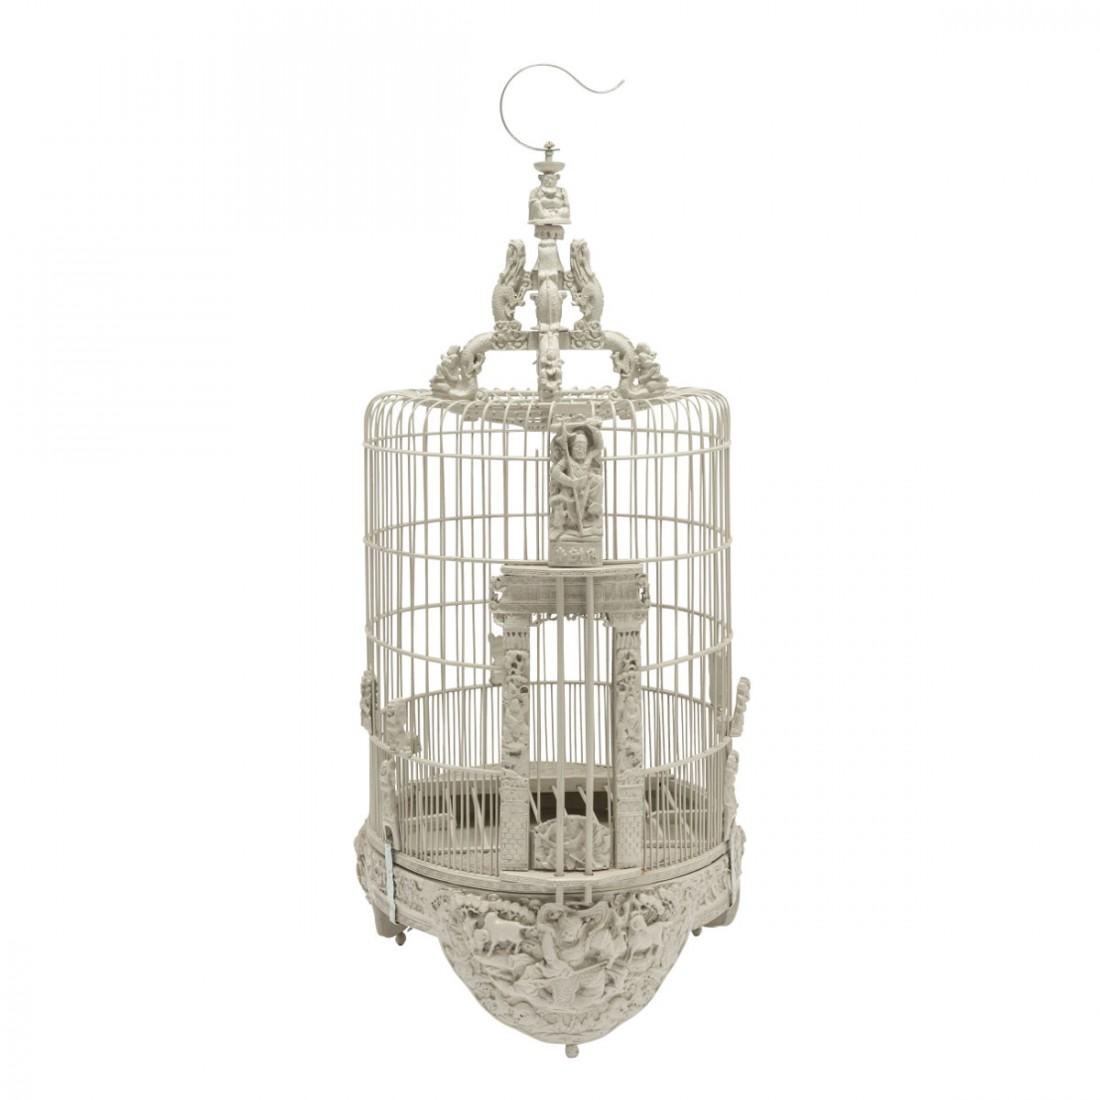 Decorative Metal Bird Cage.Decorative Bird Cage